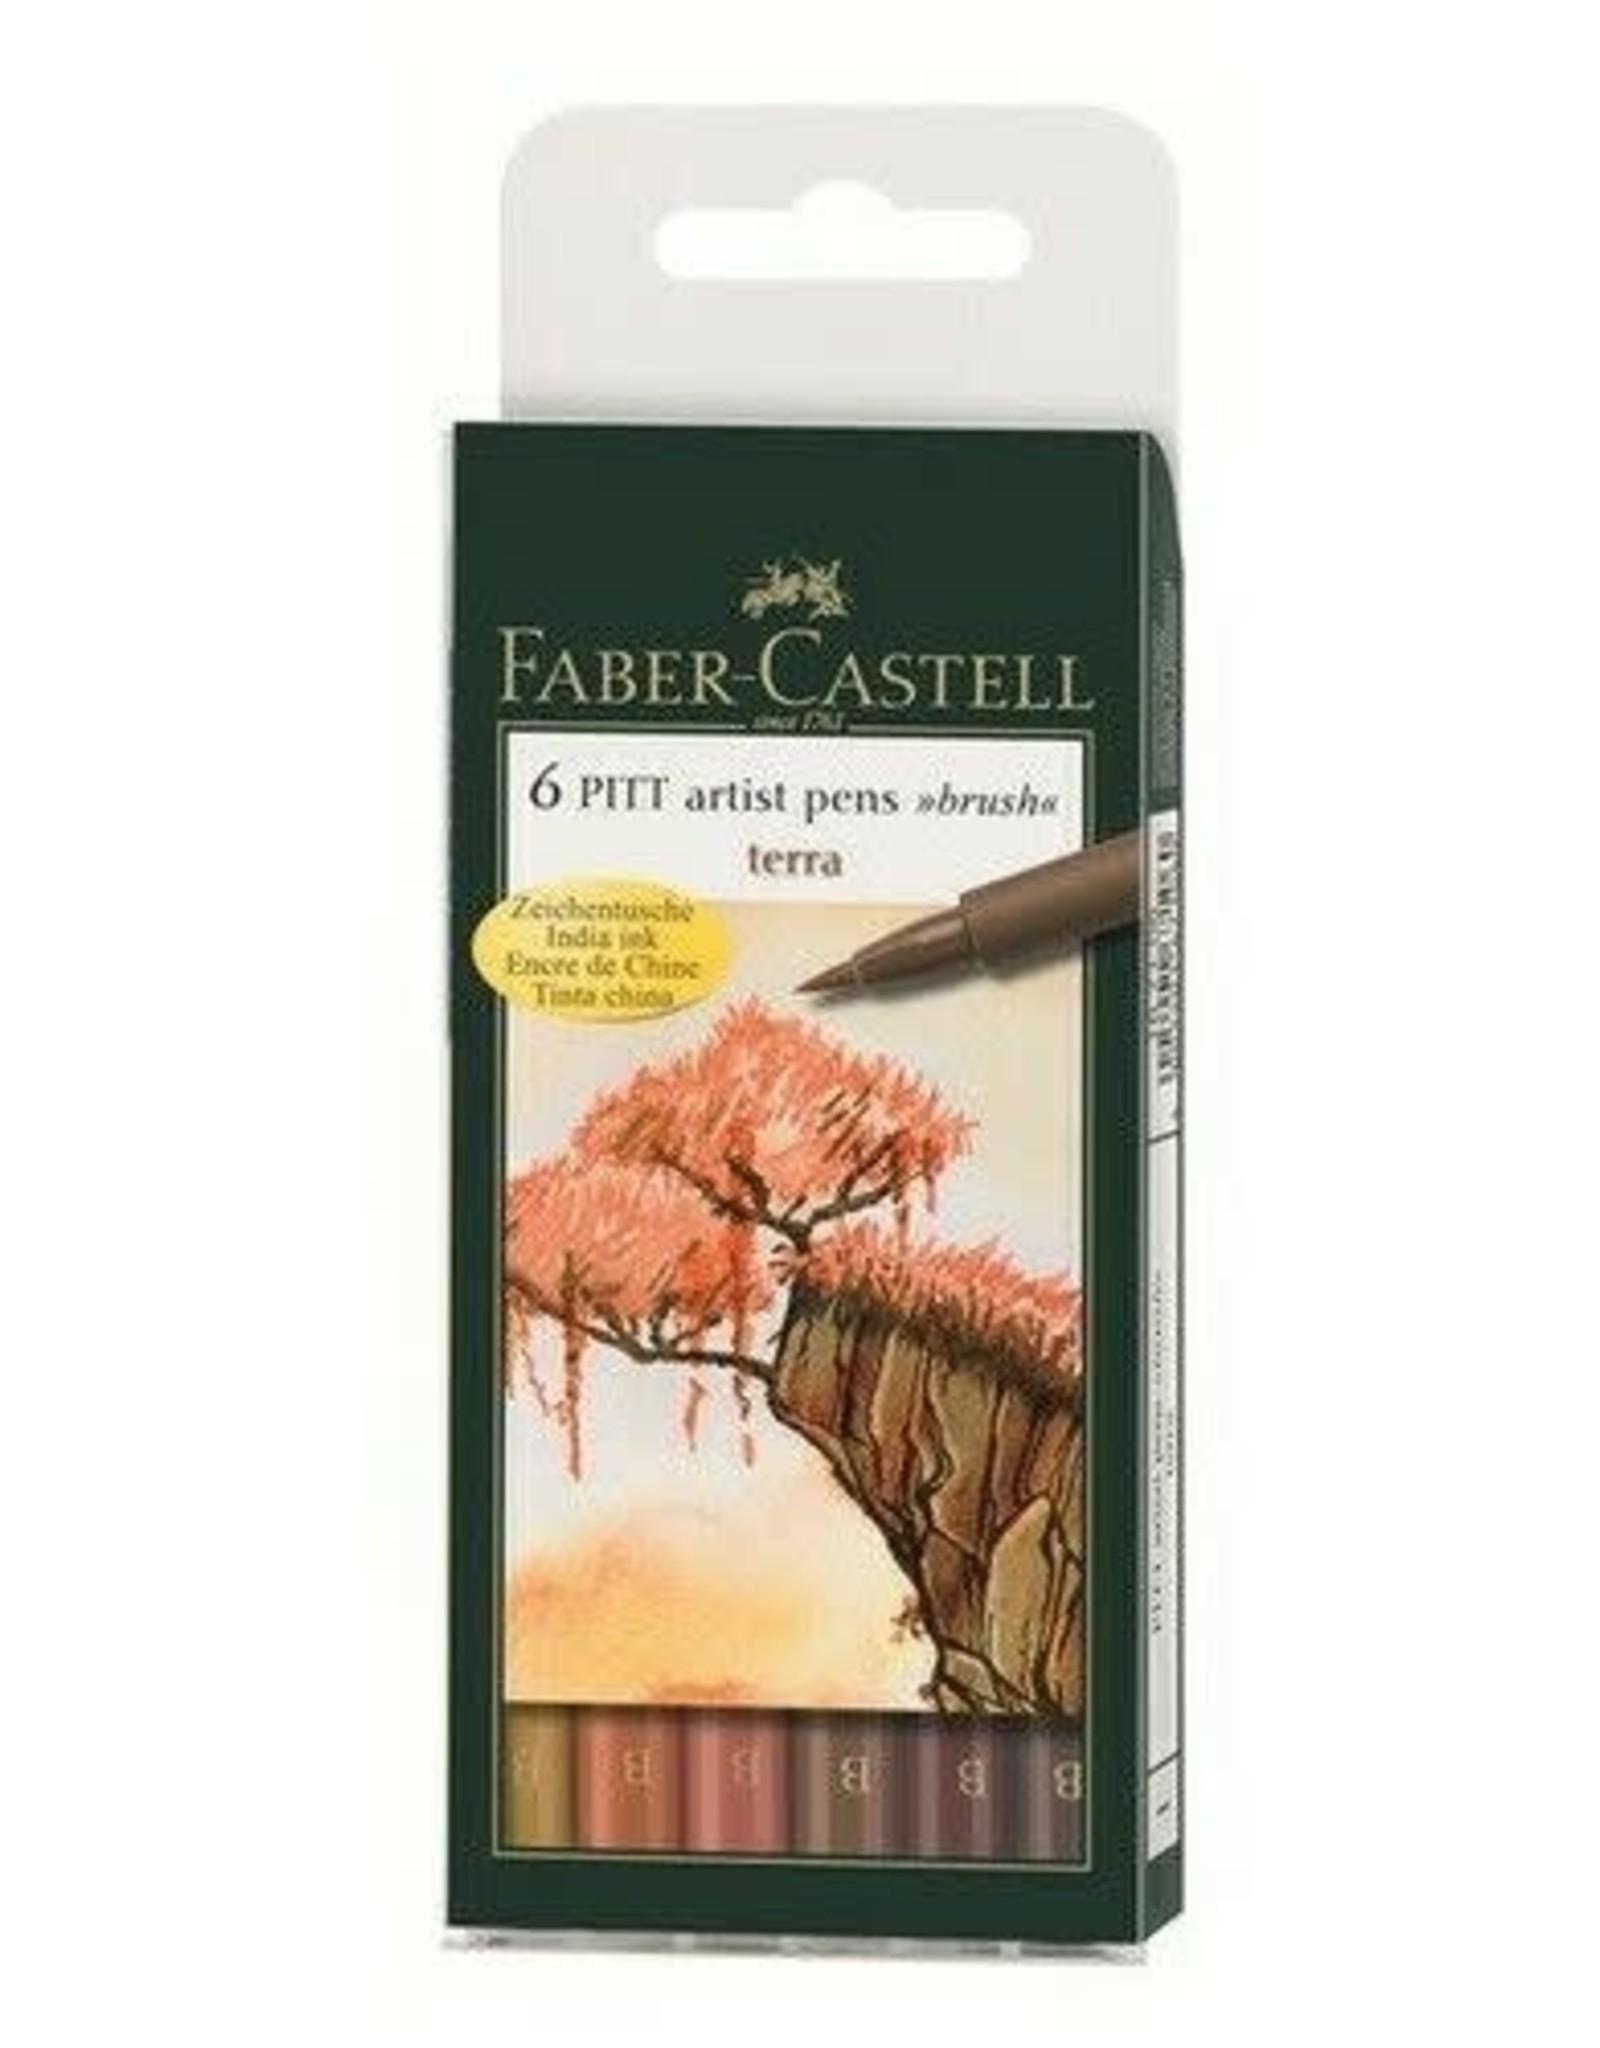 FABER-CASTELL Faber-Castell 6 Terra Color brush pens 184, 186, 189, 180, 169, 177